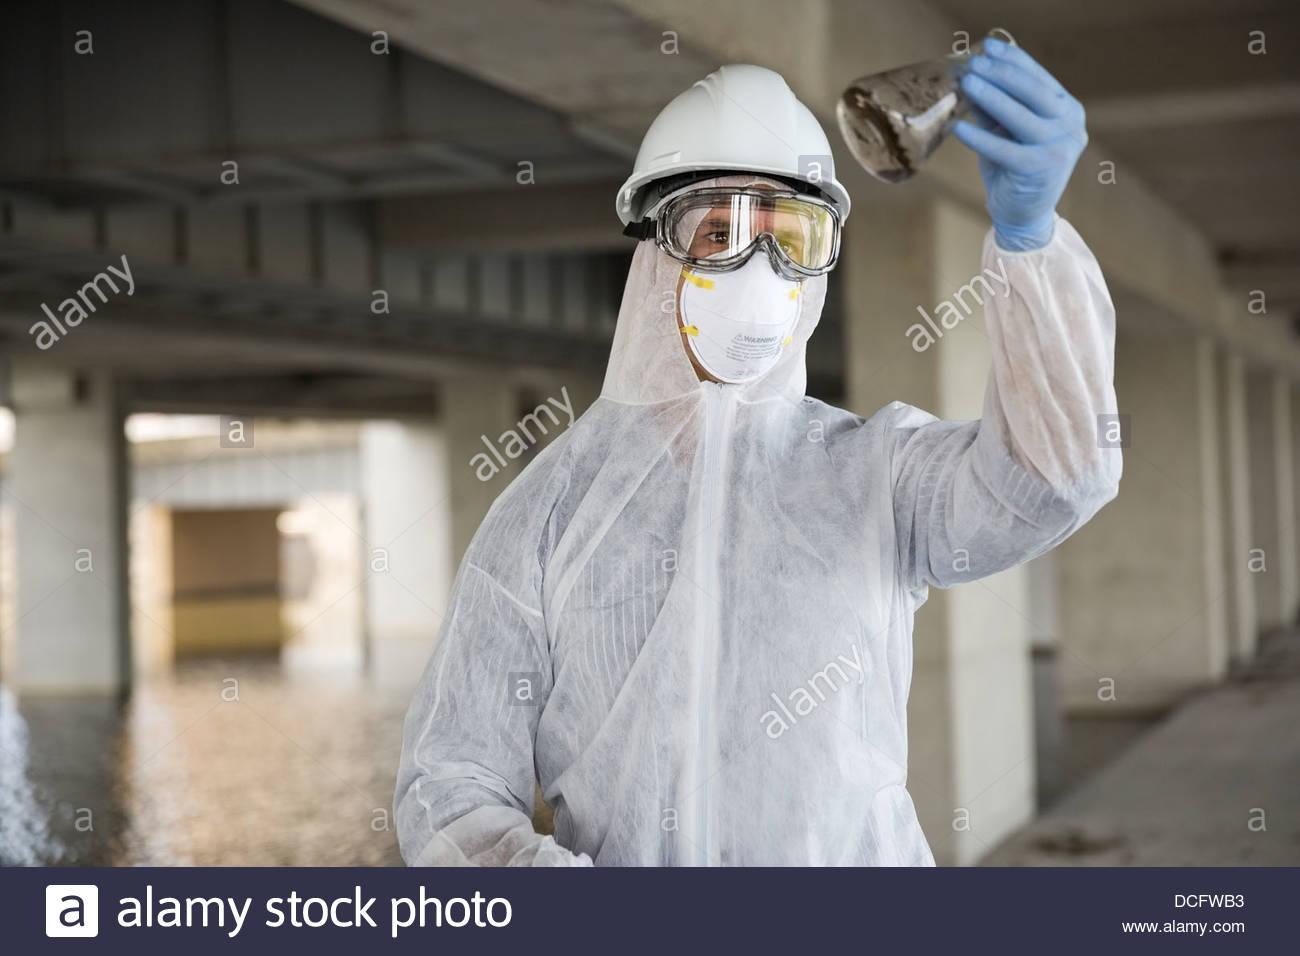 Technician examining contaminated water - Stock Image